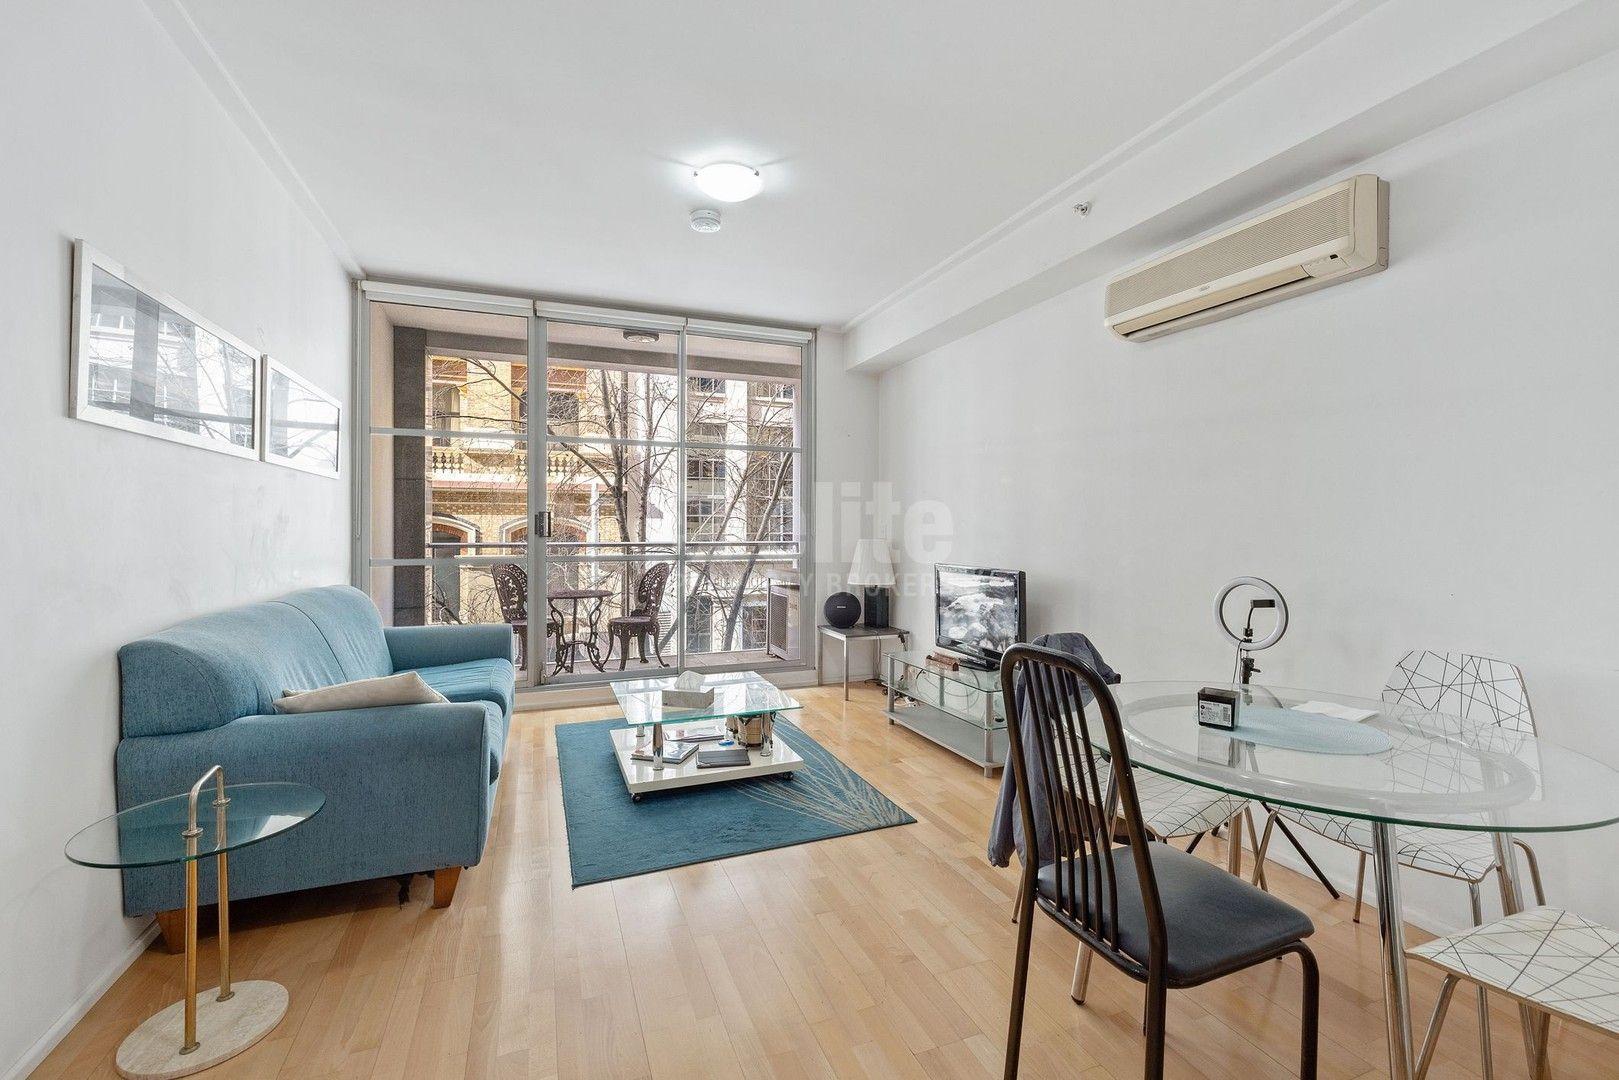 1 bedrooms Apartment / Unit / Flat in 204/355 Kent Street SYDNEY NSW, 2000